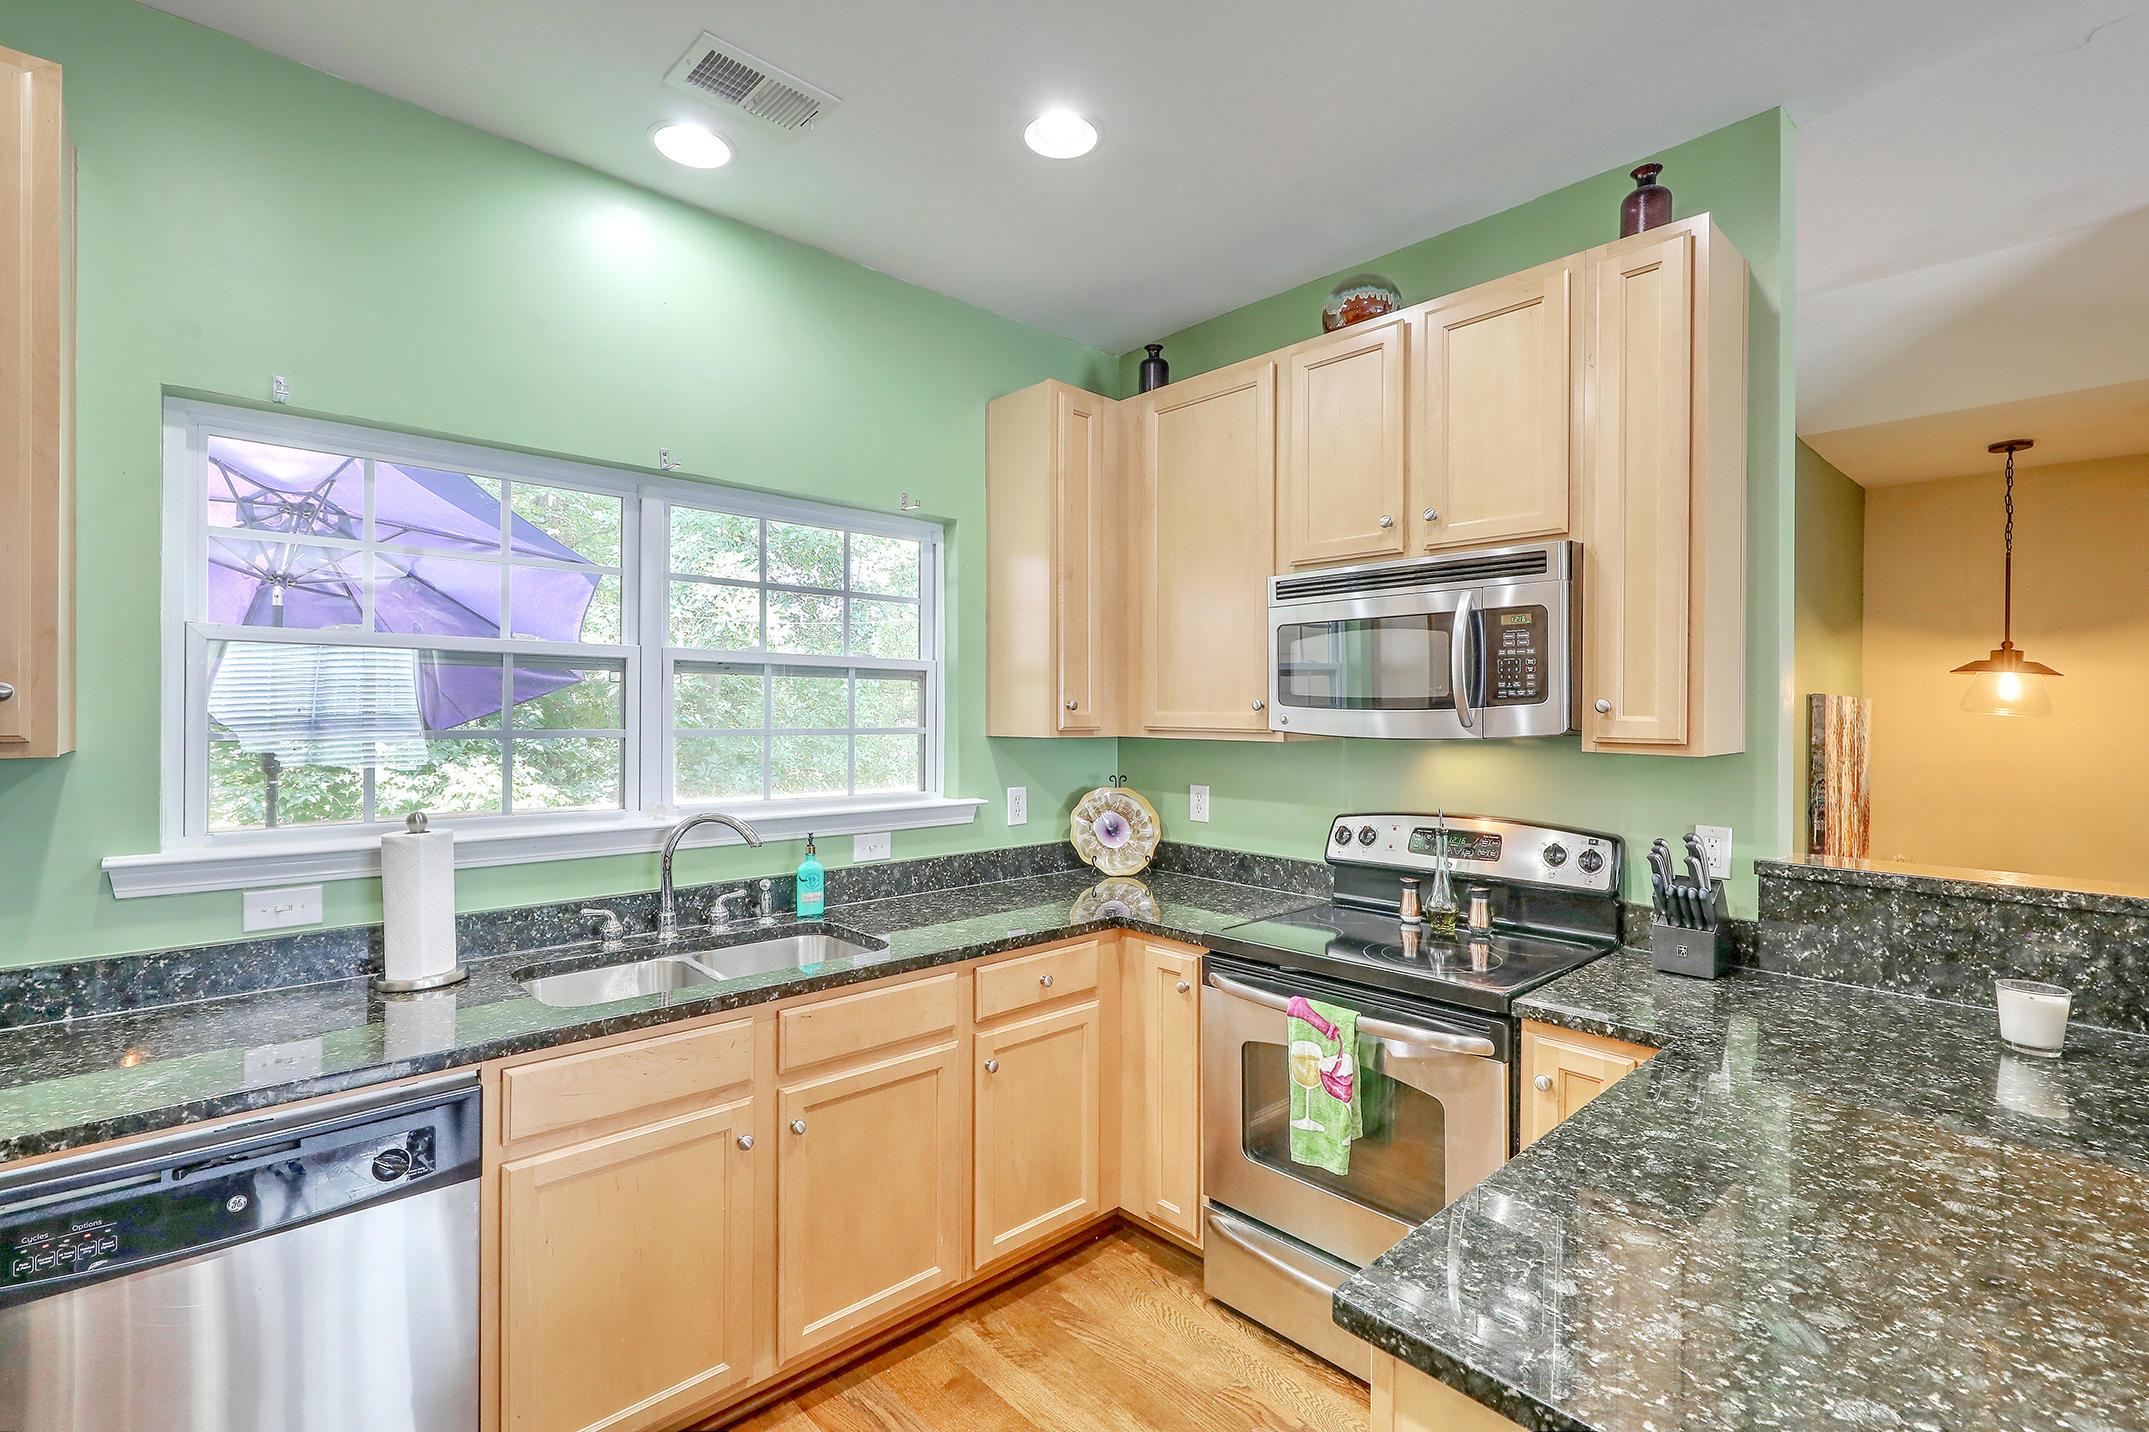 Ashley Park Homes For Sale - 4025 Hartland, Charleston, SC - 26